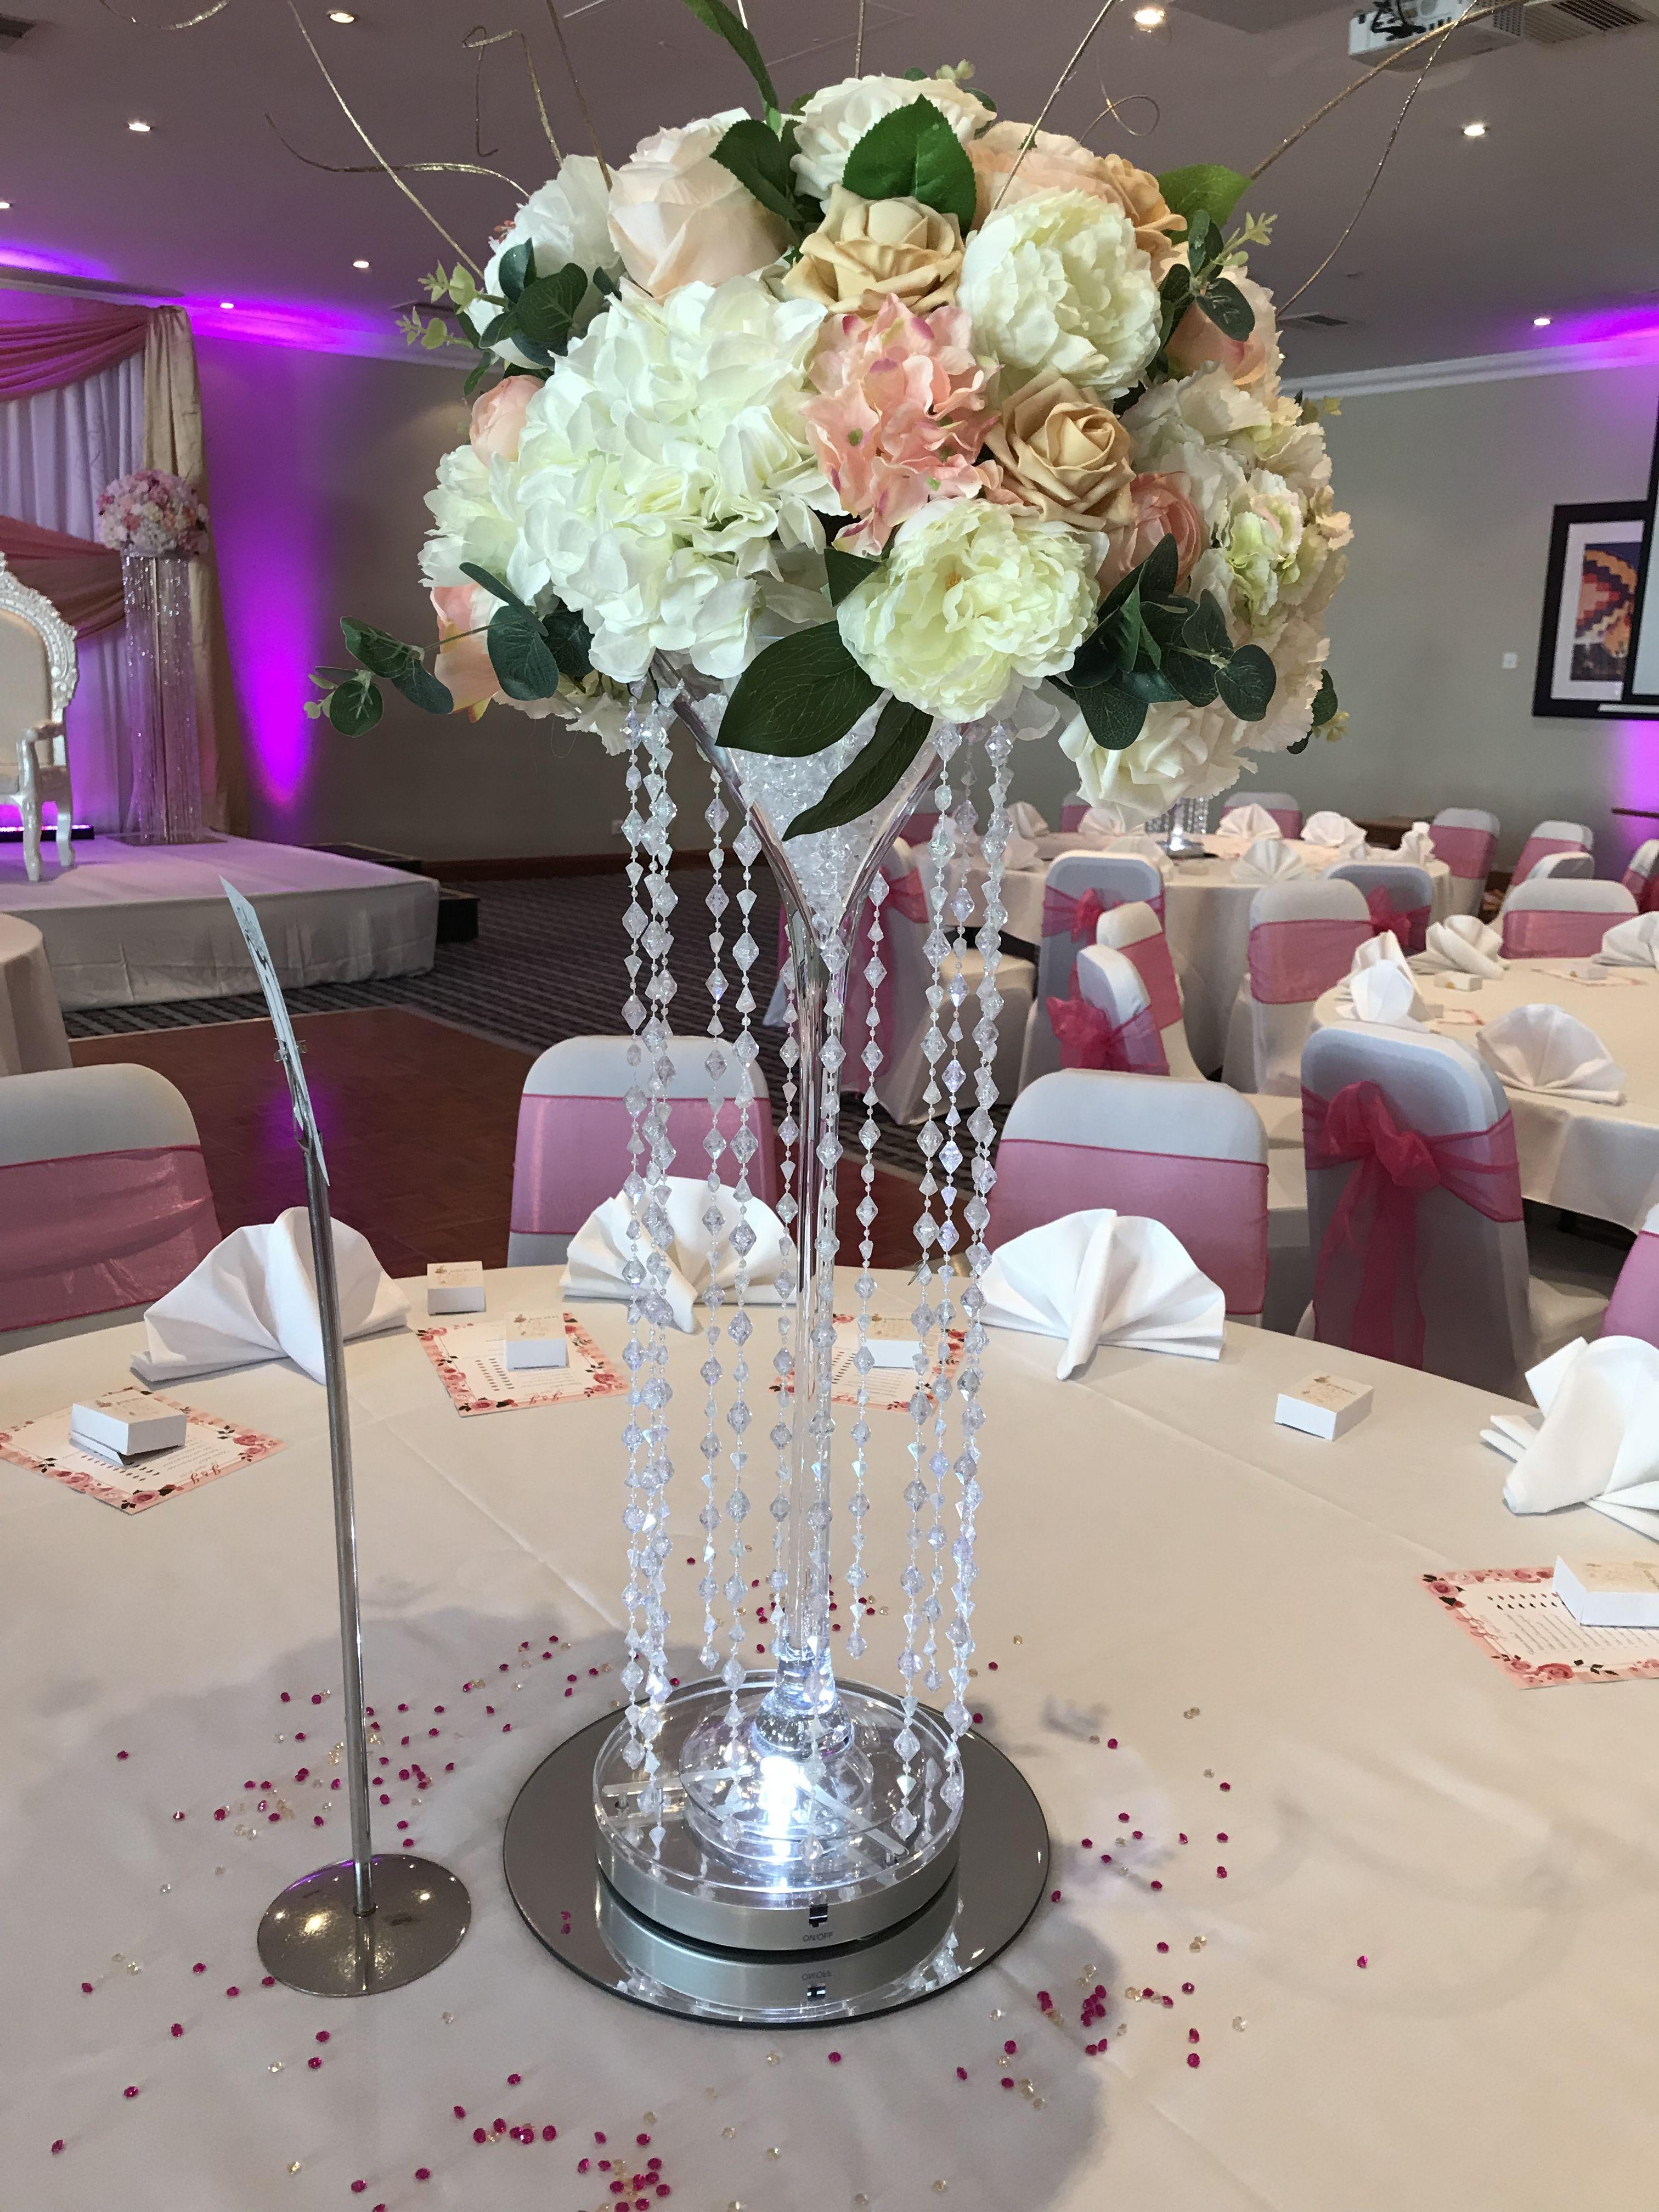 Oversize Martini Glass Center Piece With Silk Flowers Enchanted Wedding Silk Flower Arrangements Silk Flowers